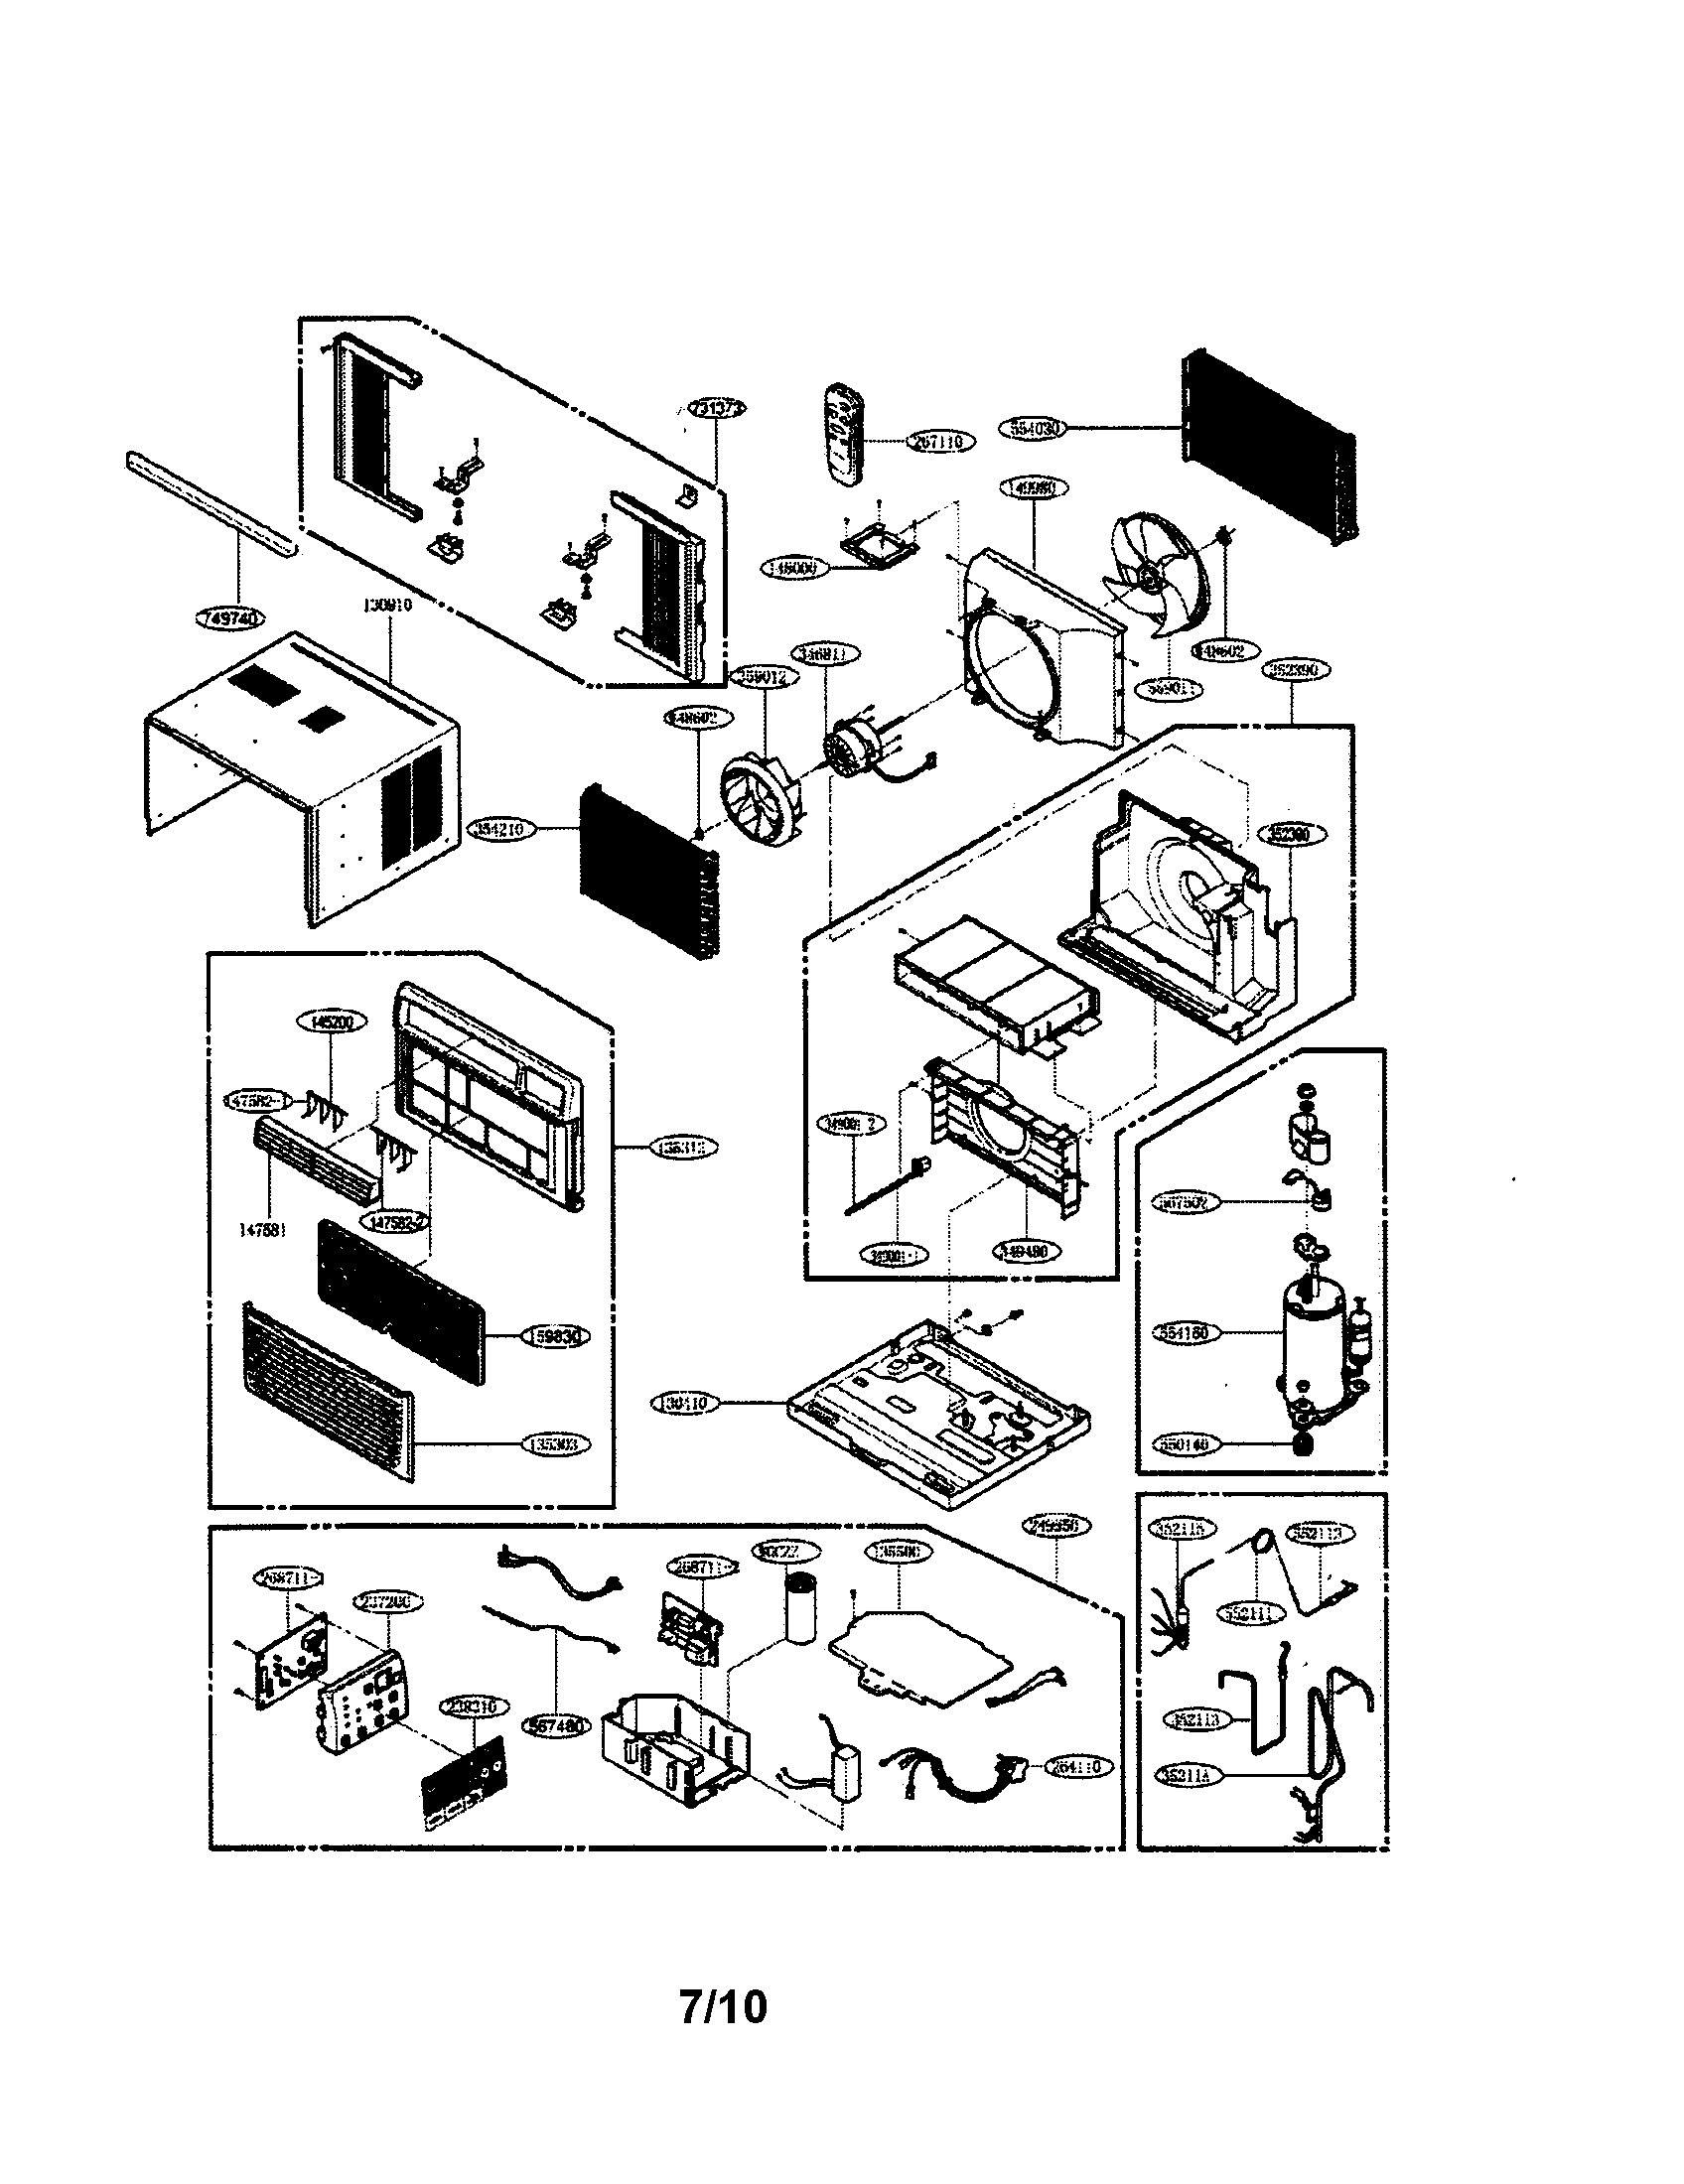 Lg Air Conditioner Parts Manual